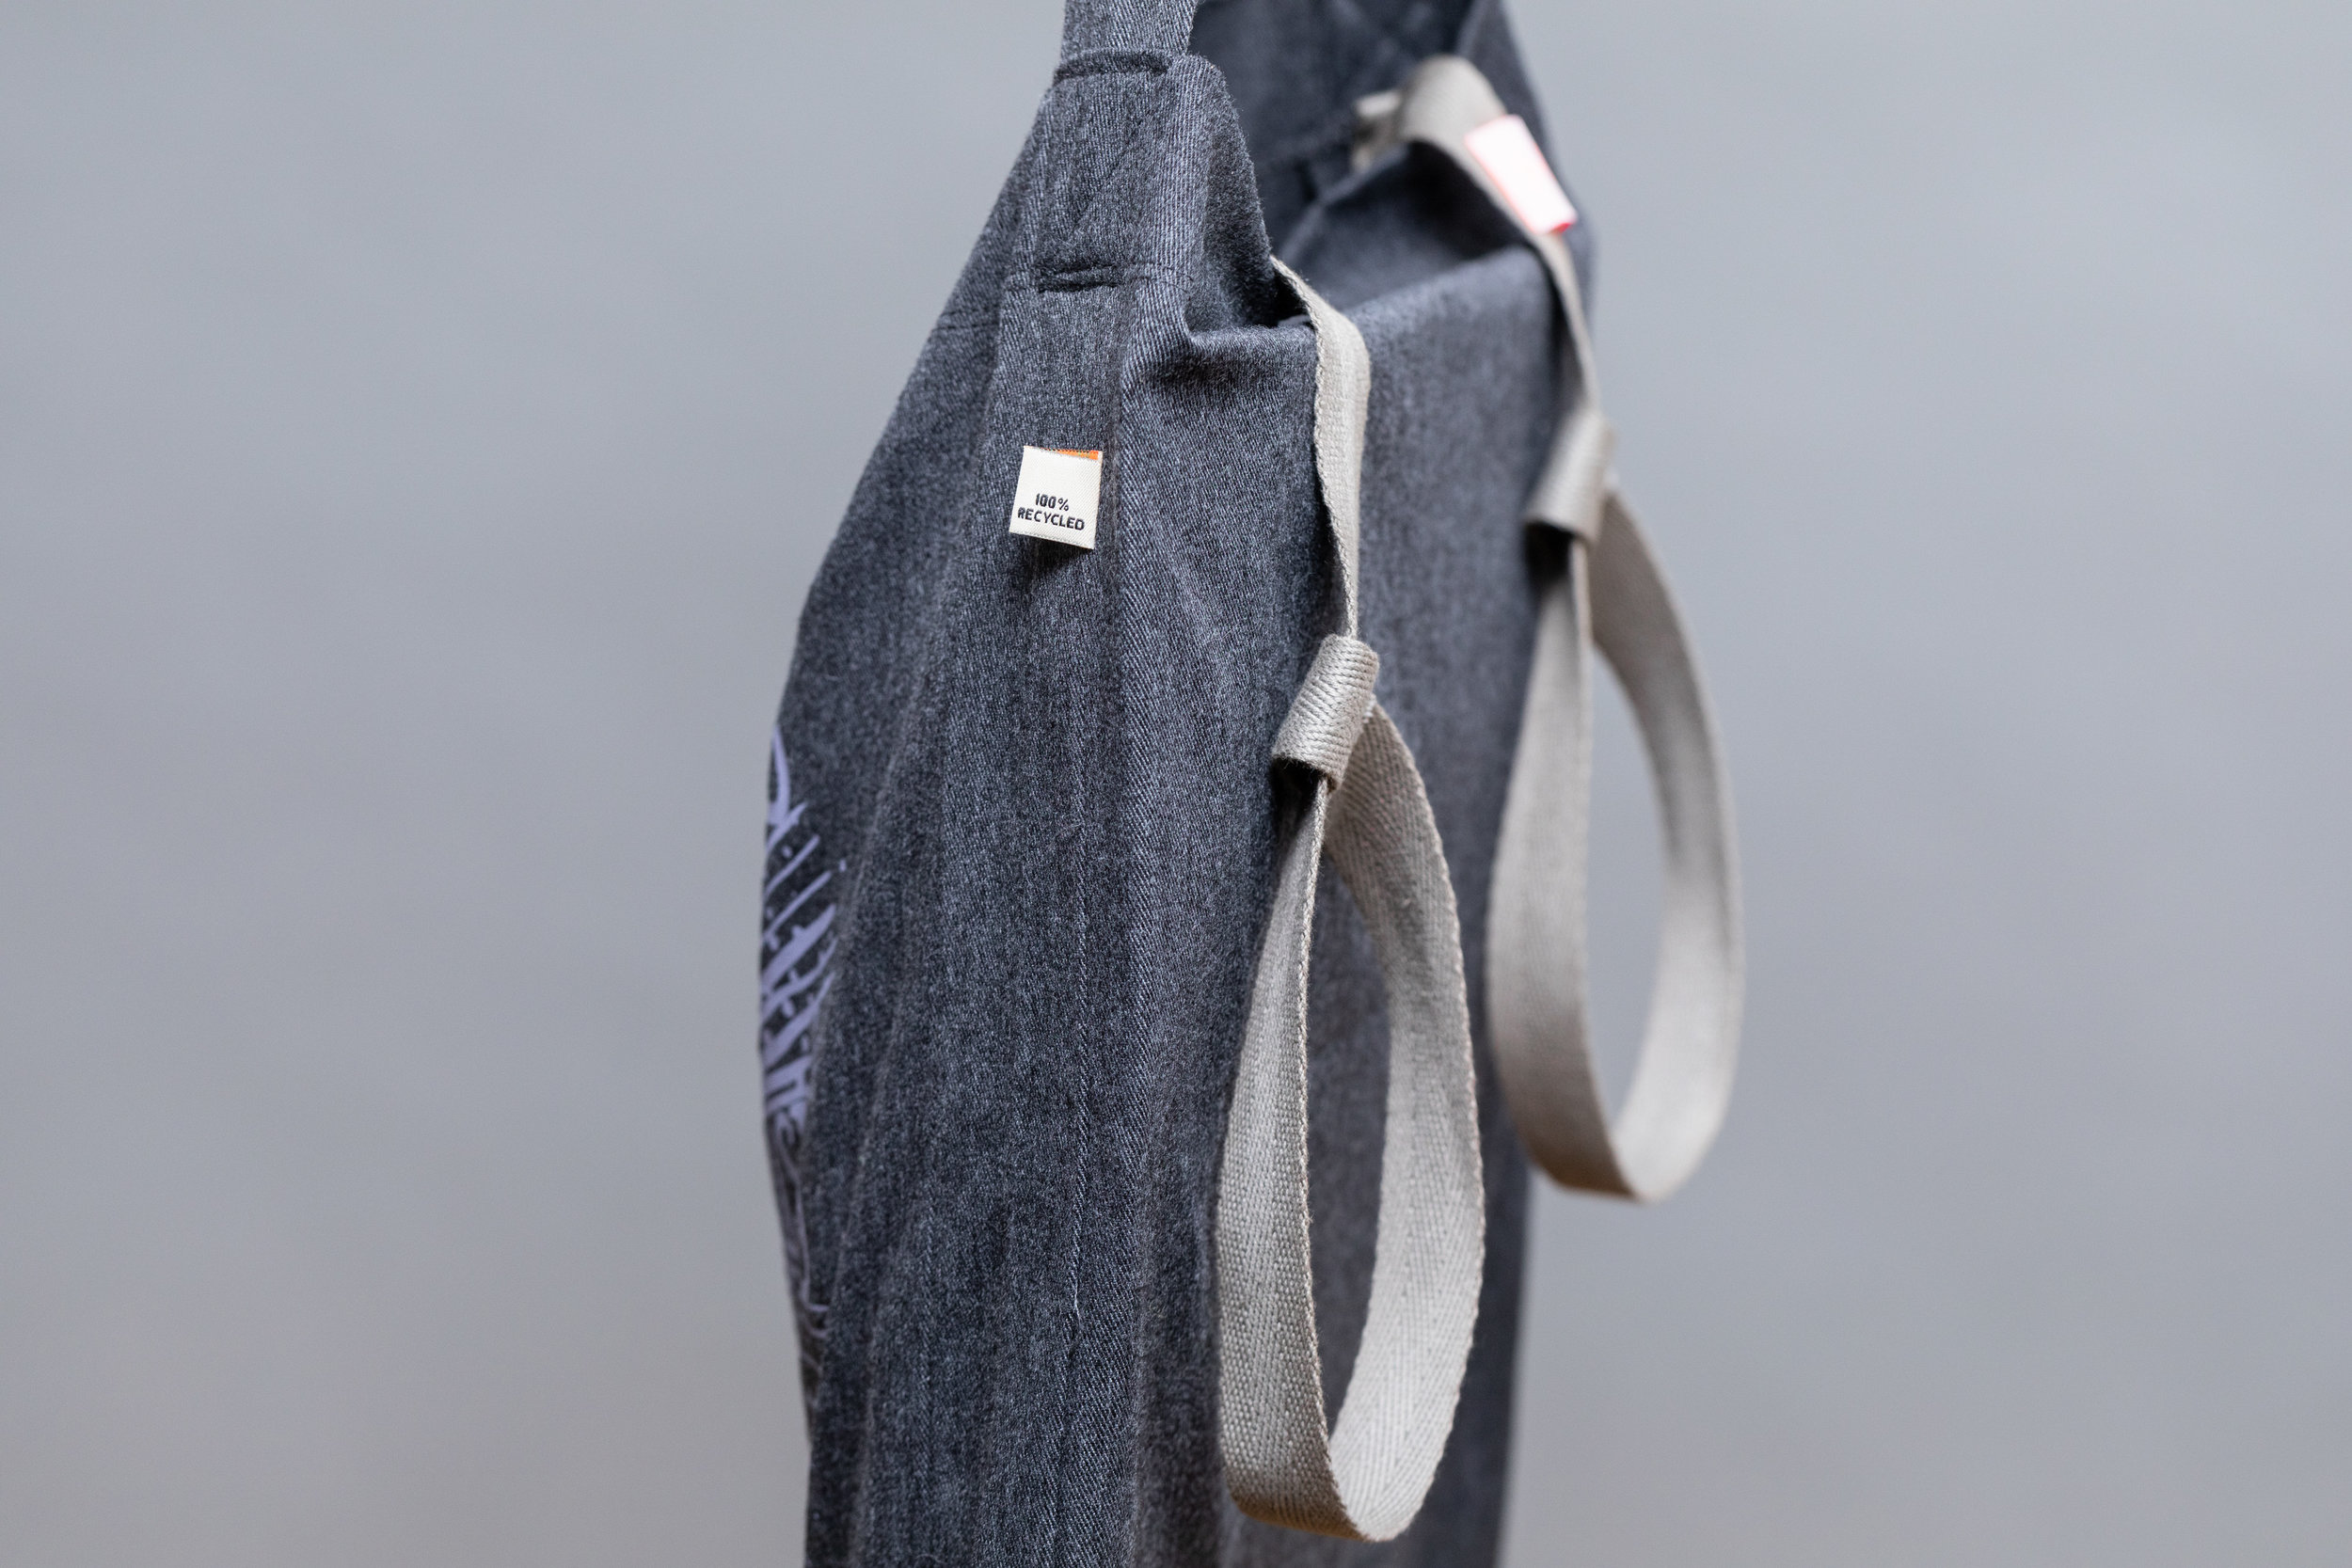 twists and turns tote bag nin detail hang.jpg